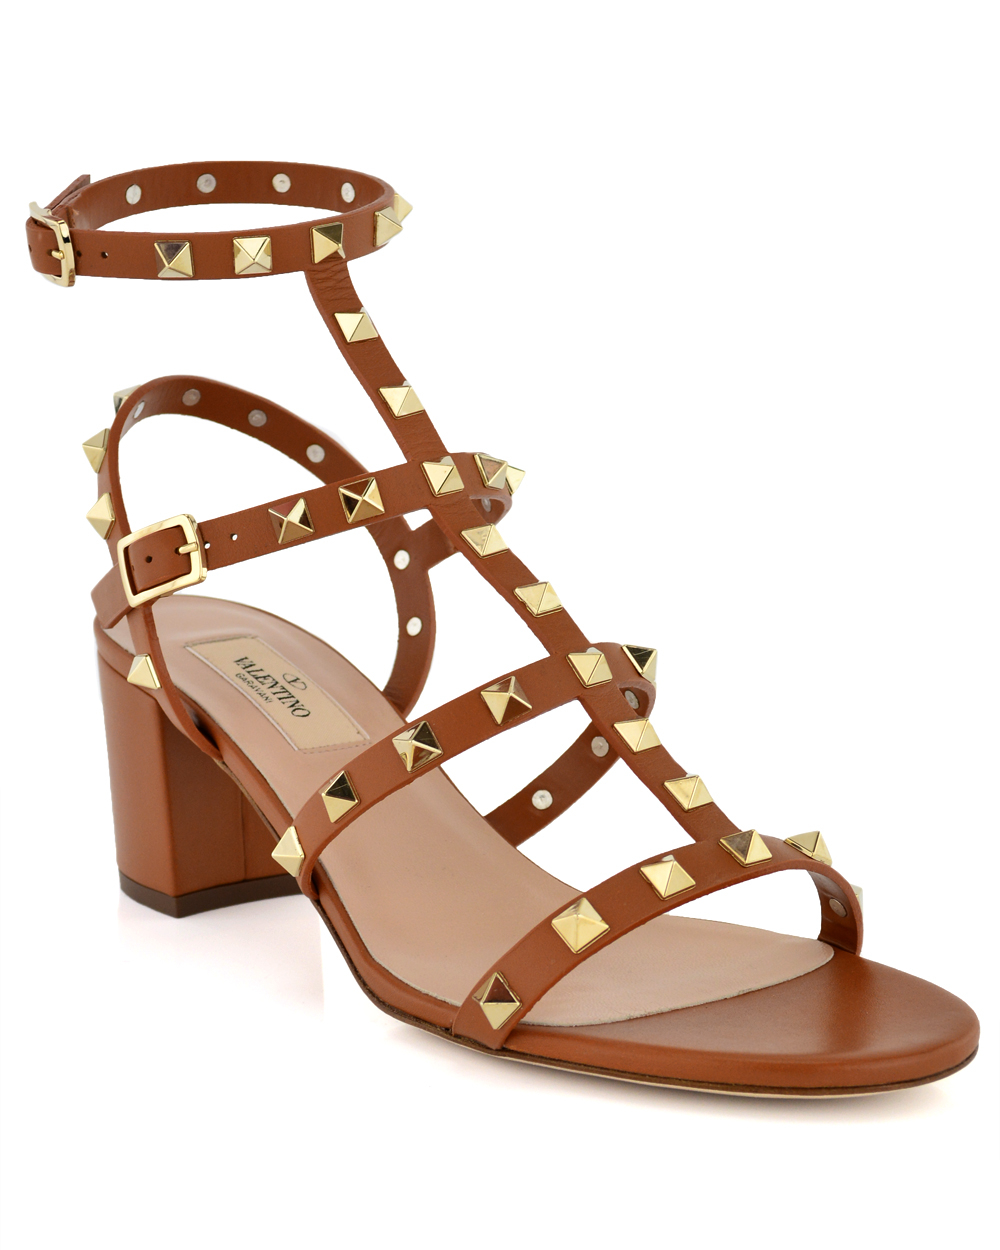 6419df84016 Valentino - Brown Cognac Rockstud Chunky Heel Sandal - Lyst